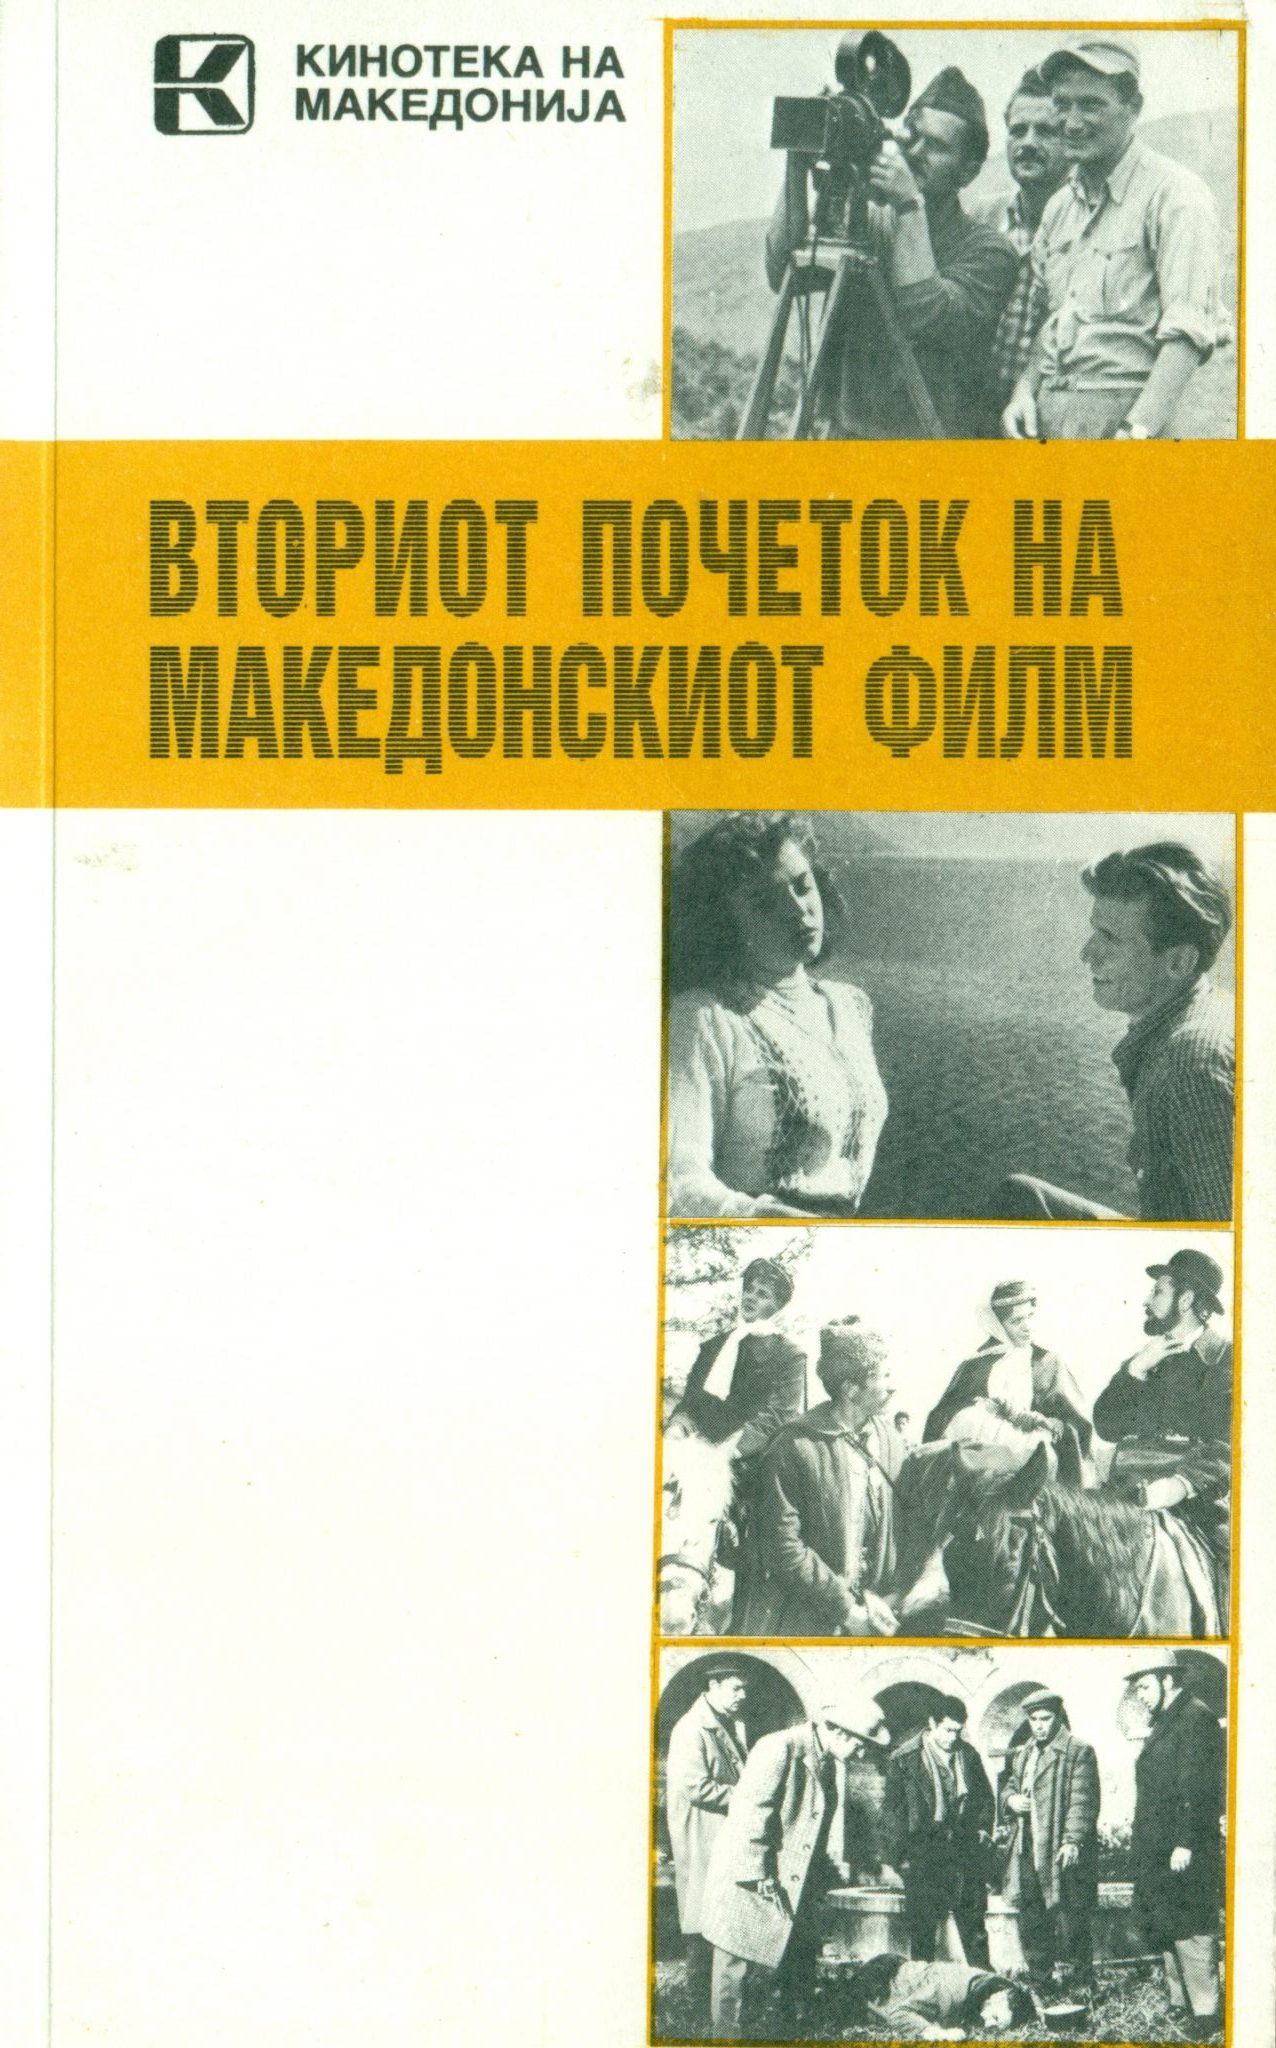 Вториот почеток на македонскиот филм